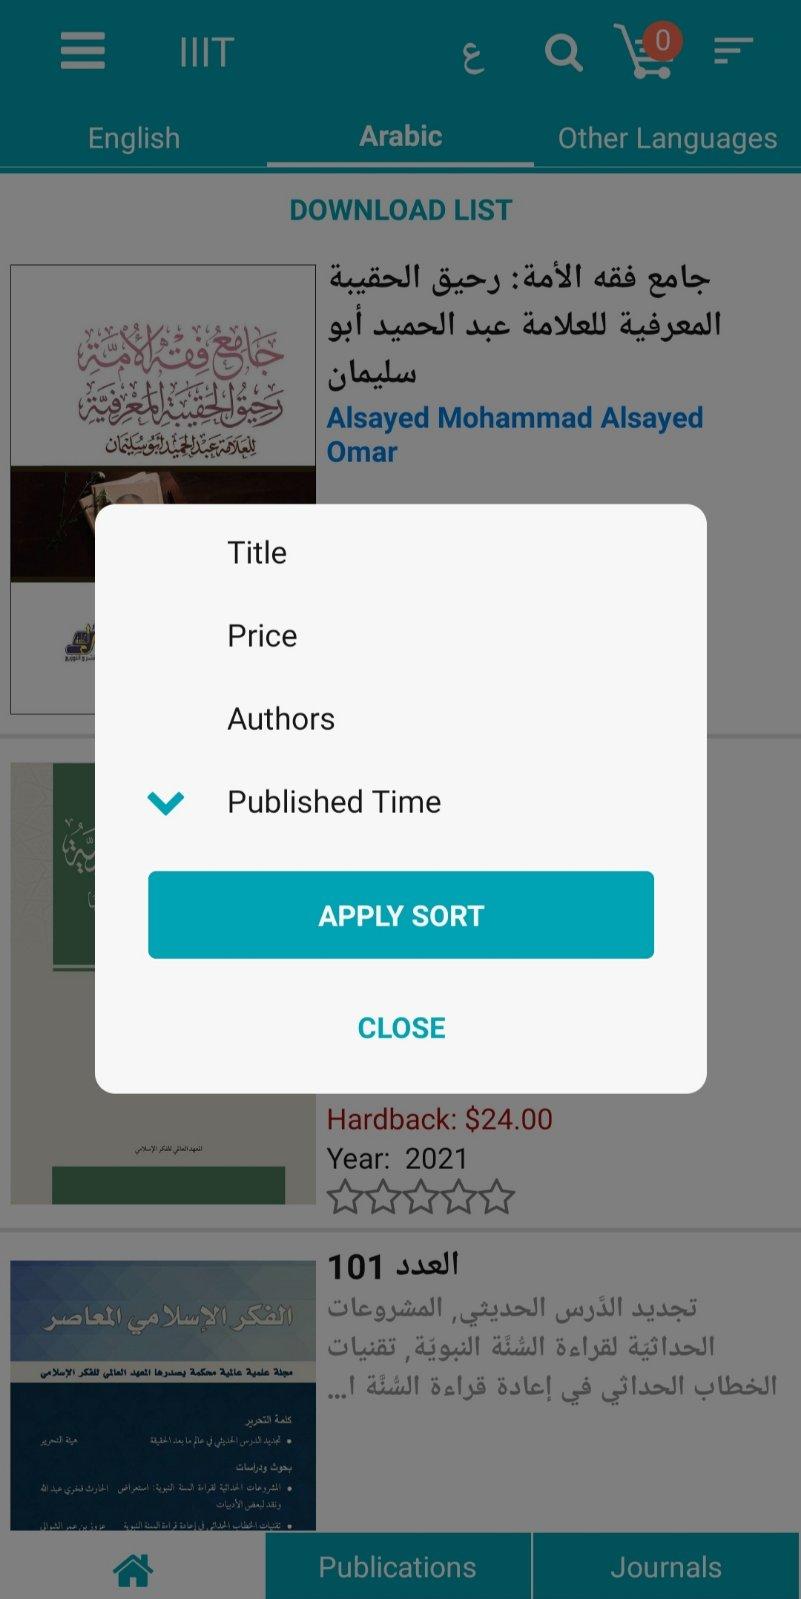 IIIT Books - Bilingual eBook Commerce Mobile App 9